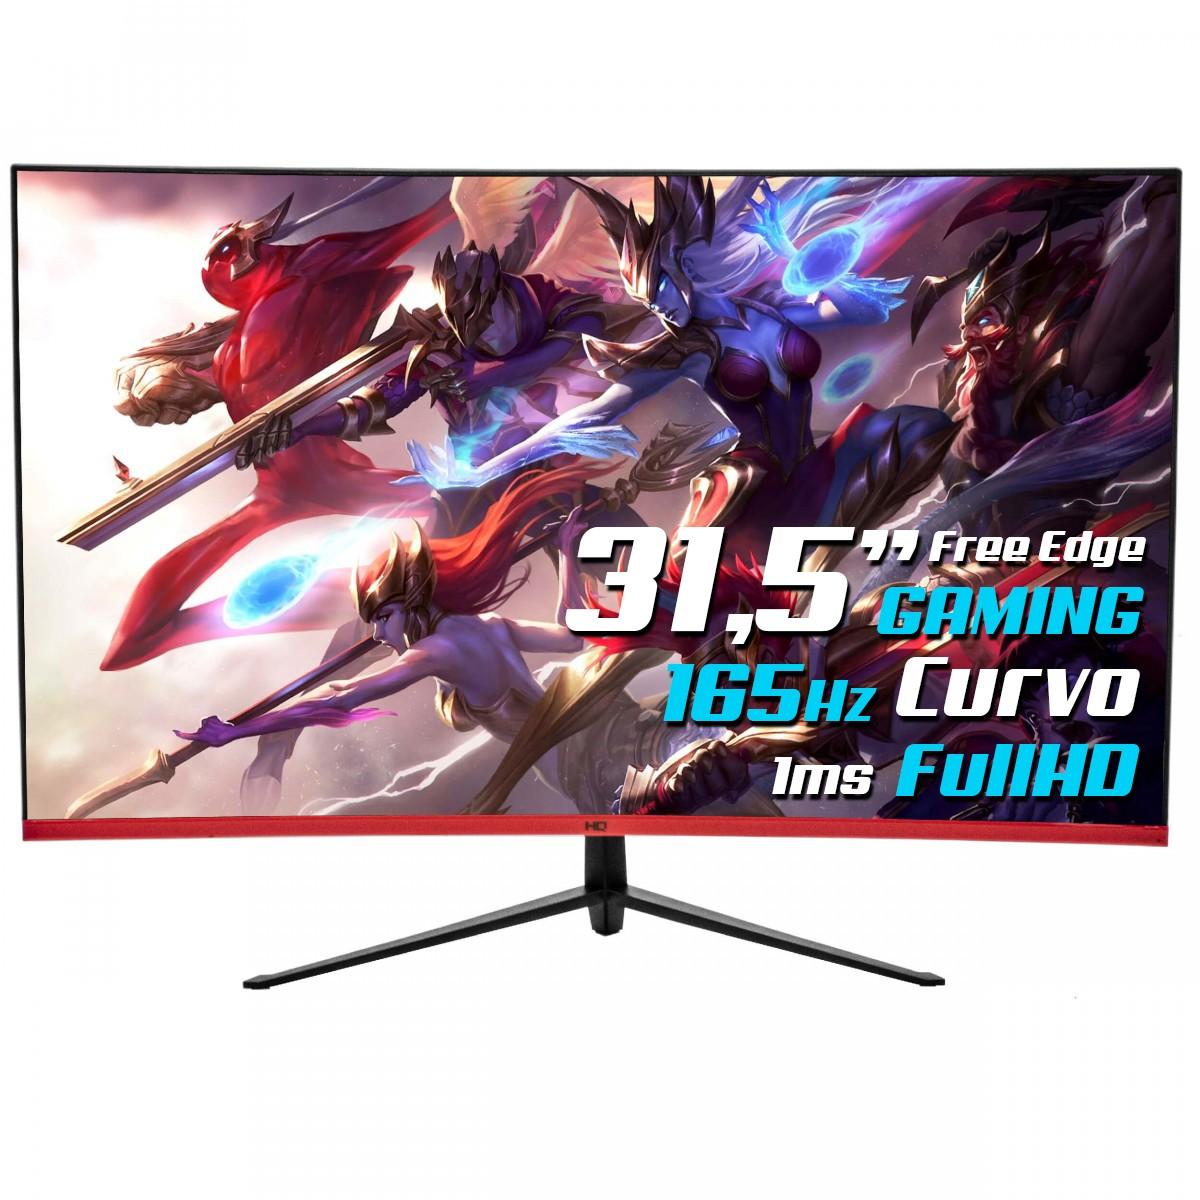 Monitor Gamer HQ Curvo 31.5 Pol, Full HD, 165Hz, 1ms, HDMI, Display Port